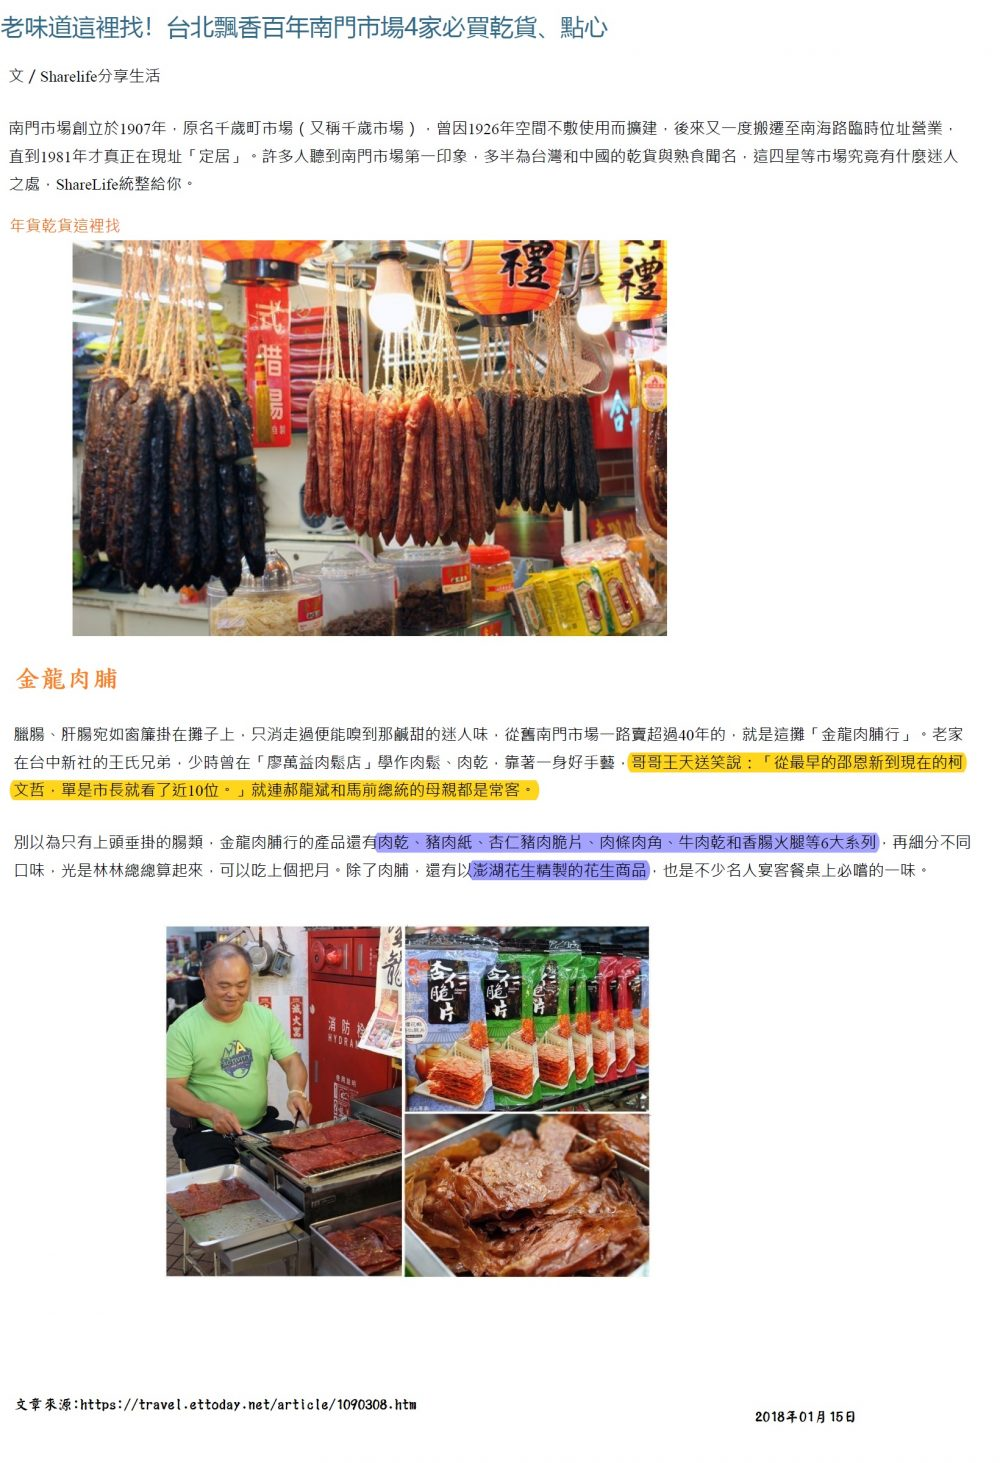 ETtoday旅遊雲-金龍肉脯